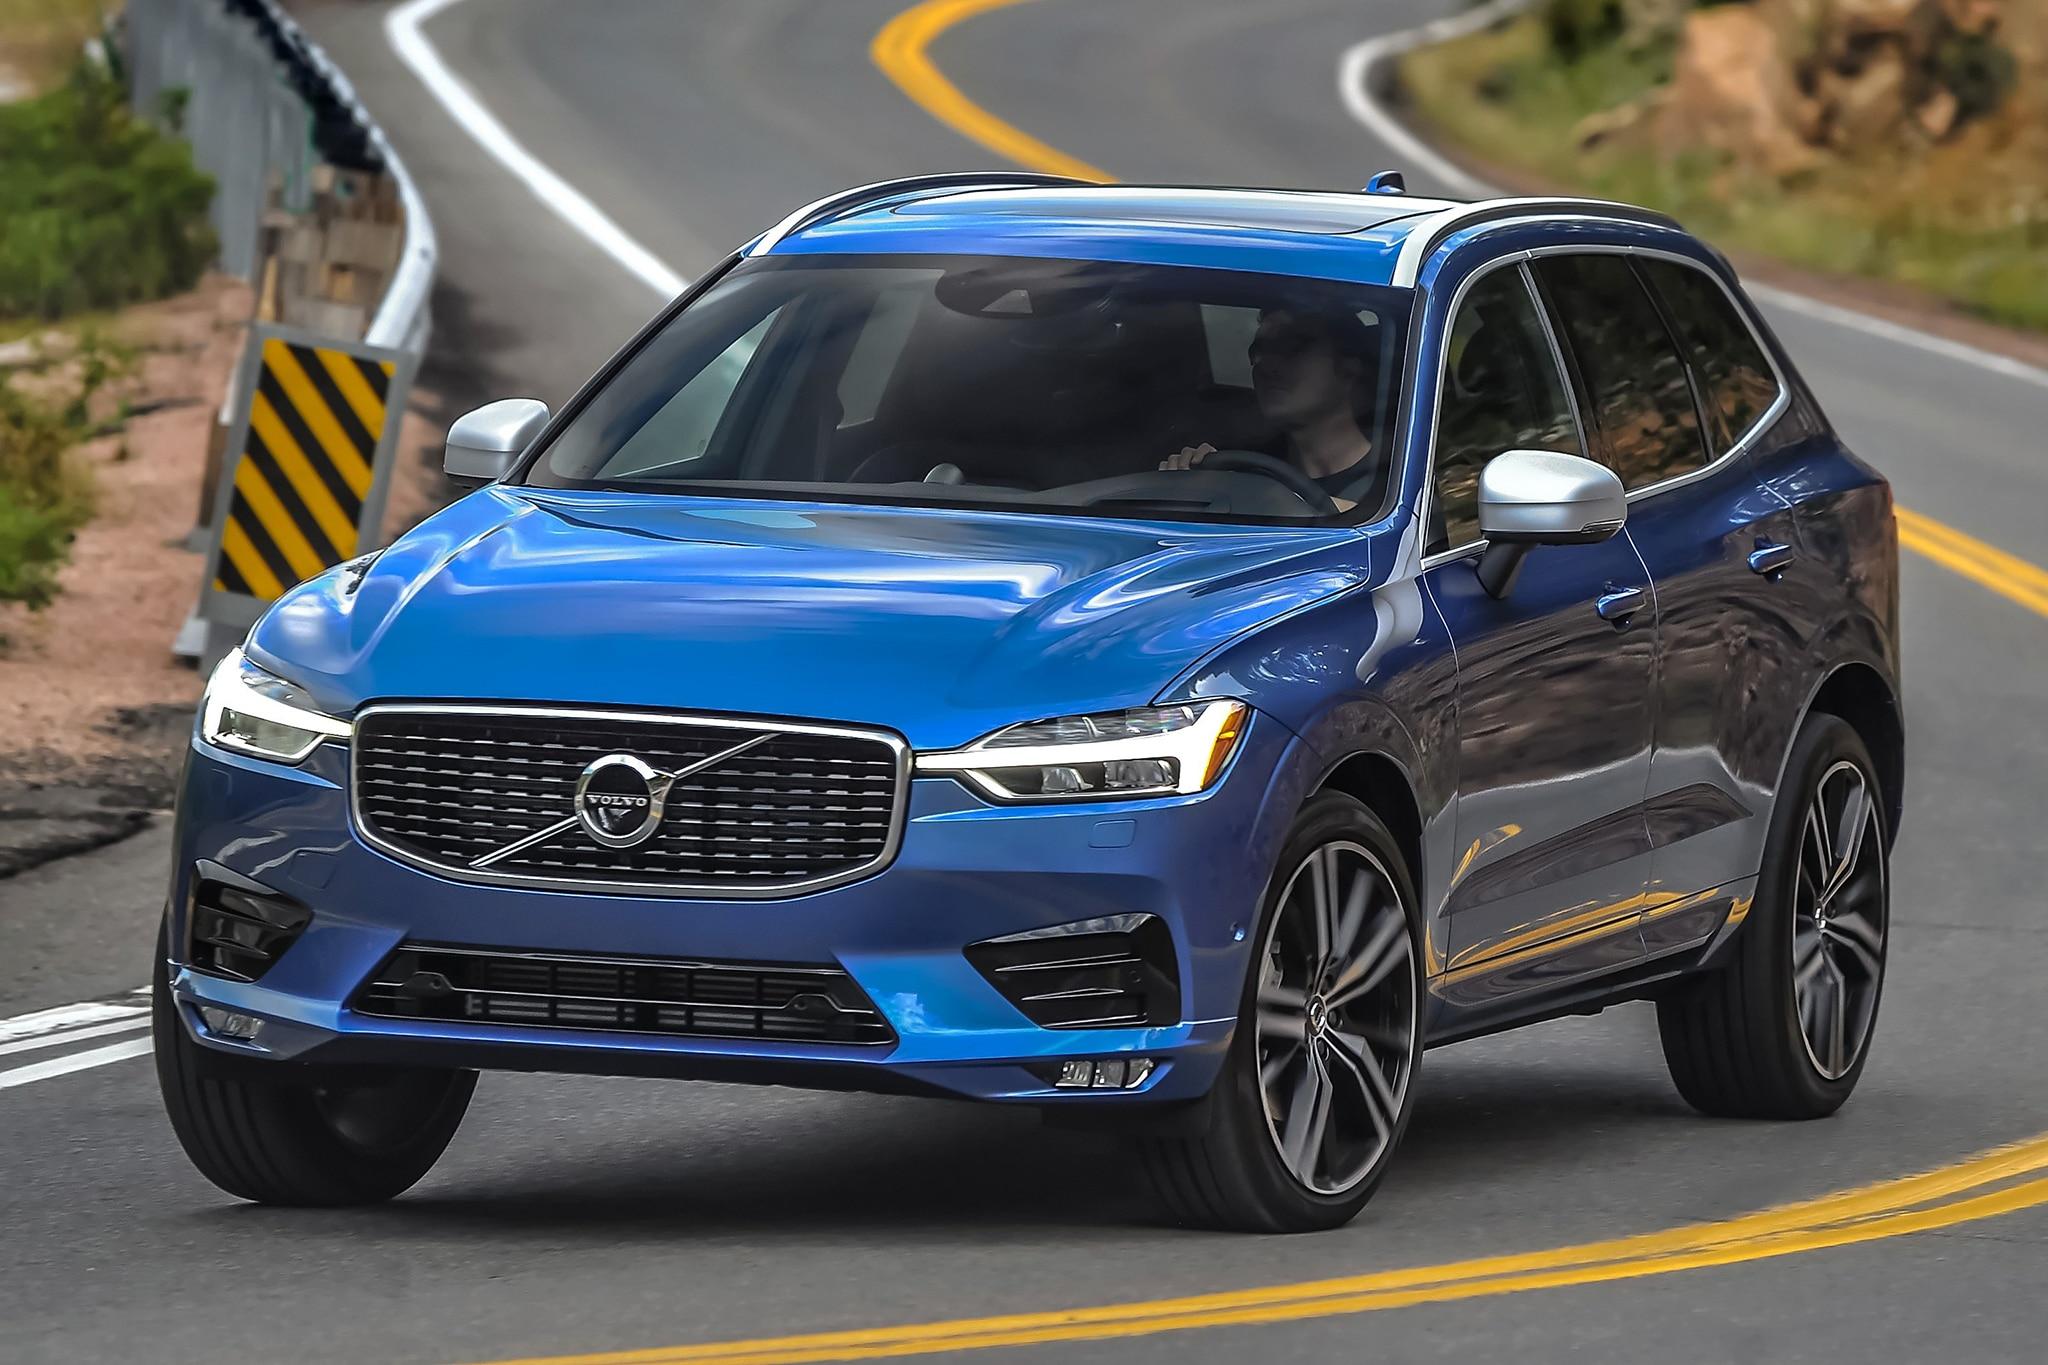 2018 Volvo XC60 T8 R Design Front Three Quarter In Motion 02